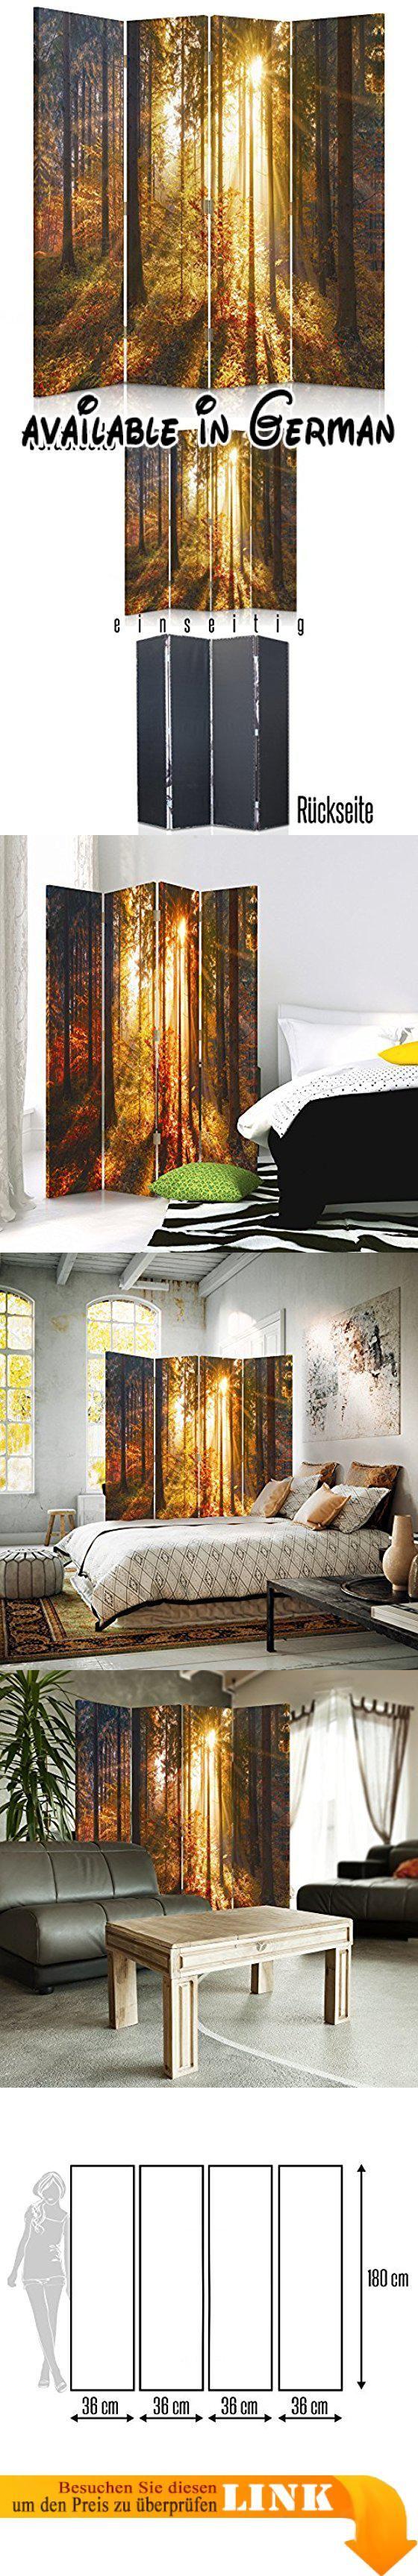 B06WRPWSBQ Feeby Frames Raumteiler Gedruckten auf Canvas Leinwand Wandschirme dekorative Trennwand Paravent einseitig 4